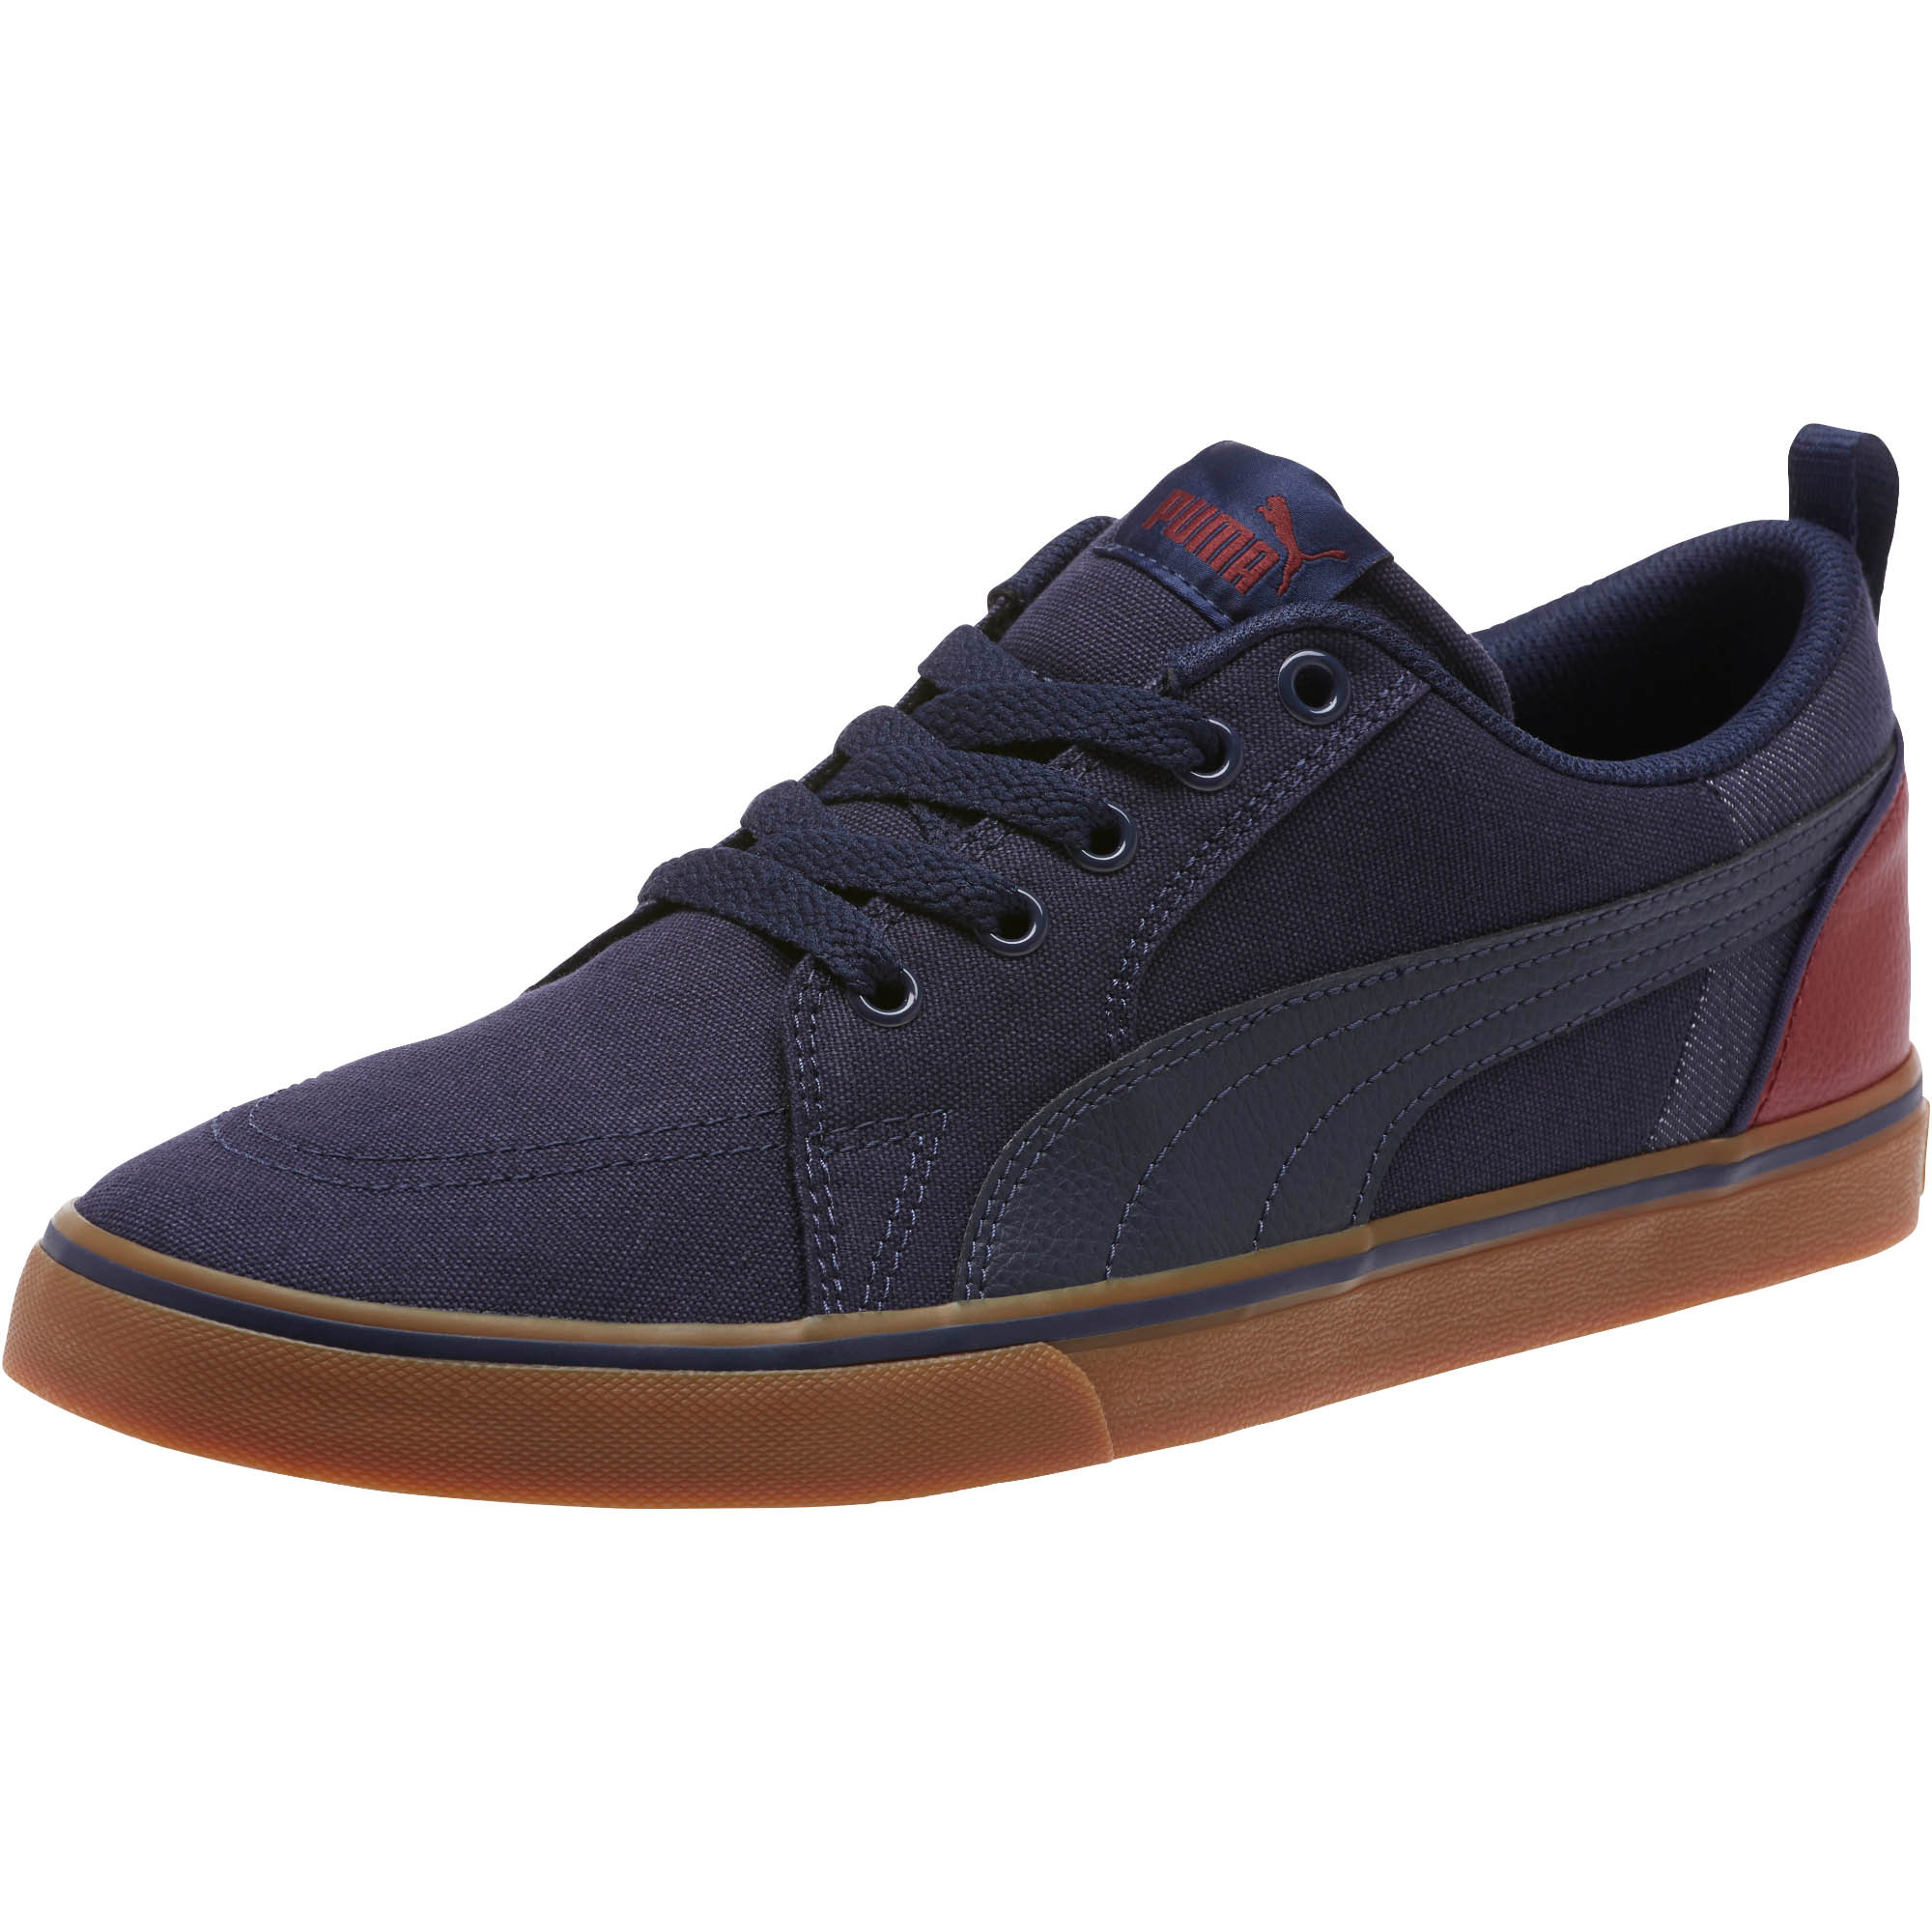 PUMA-PUMA-Bridger-Men-039-s-Sneakers-Men-Shoe-Basics thumbnail 15